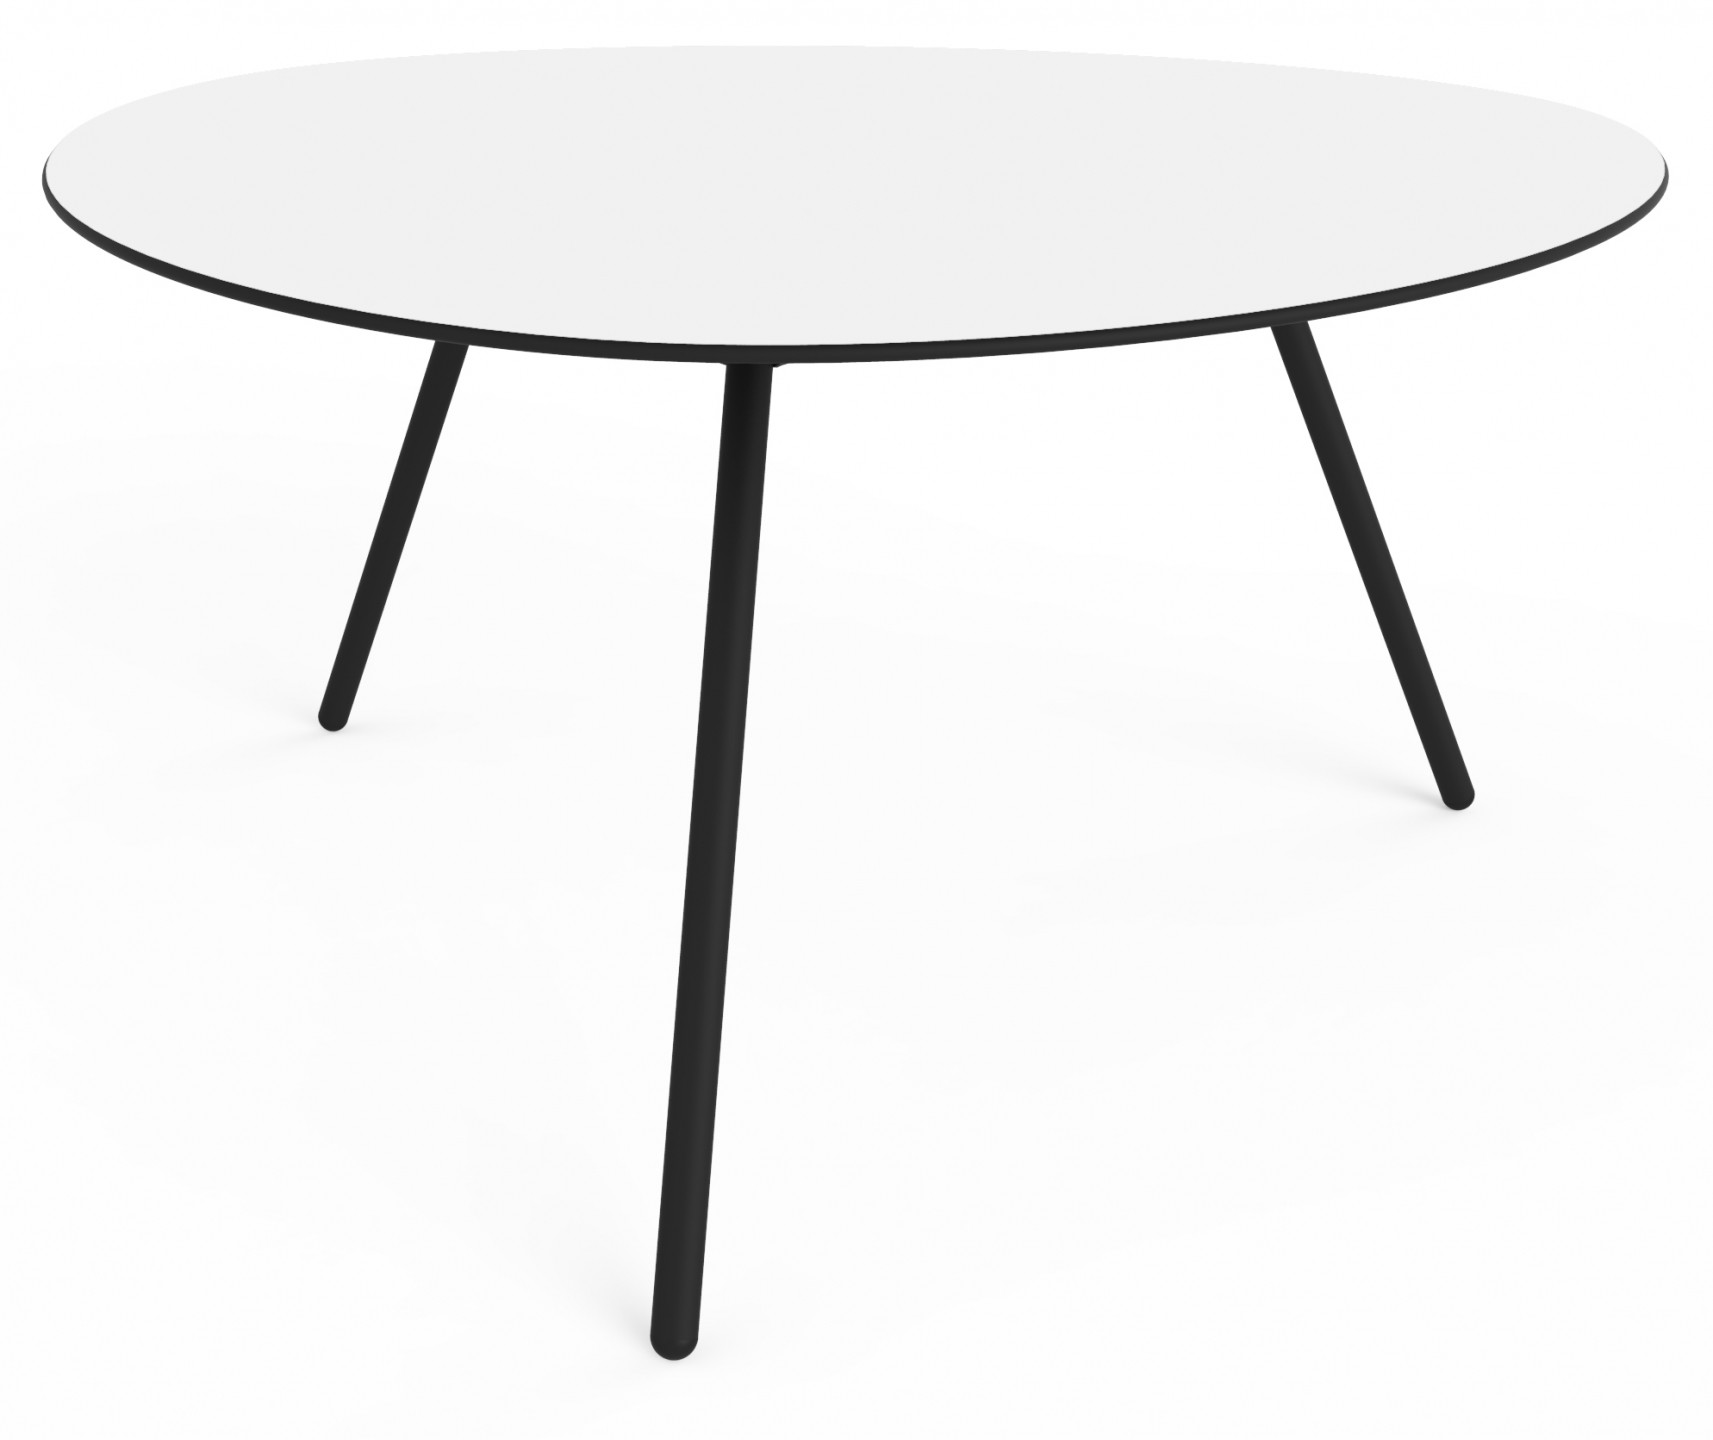 Tafelonderstel sc509 onderstellen tafels mv kantoor for Tafel samenstellen